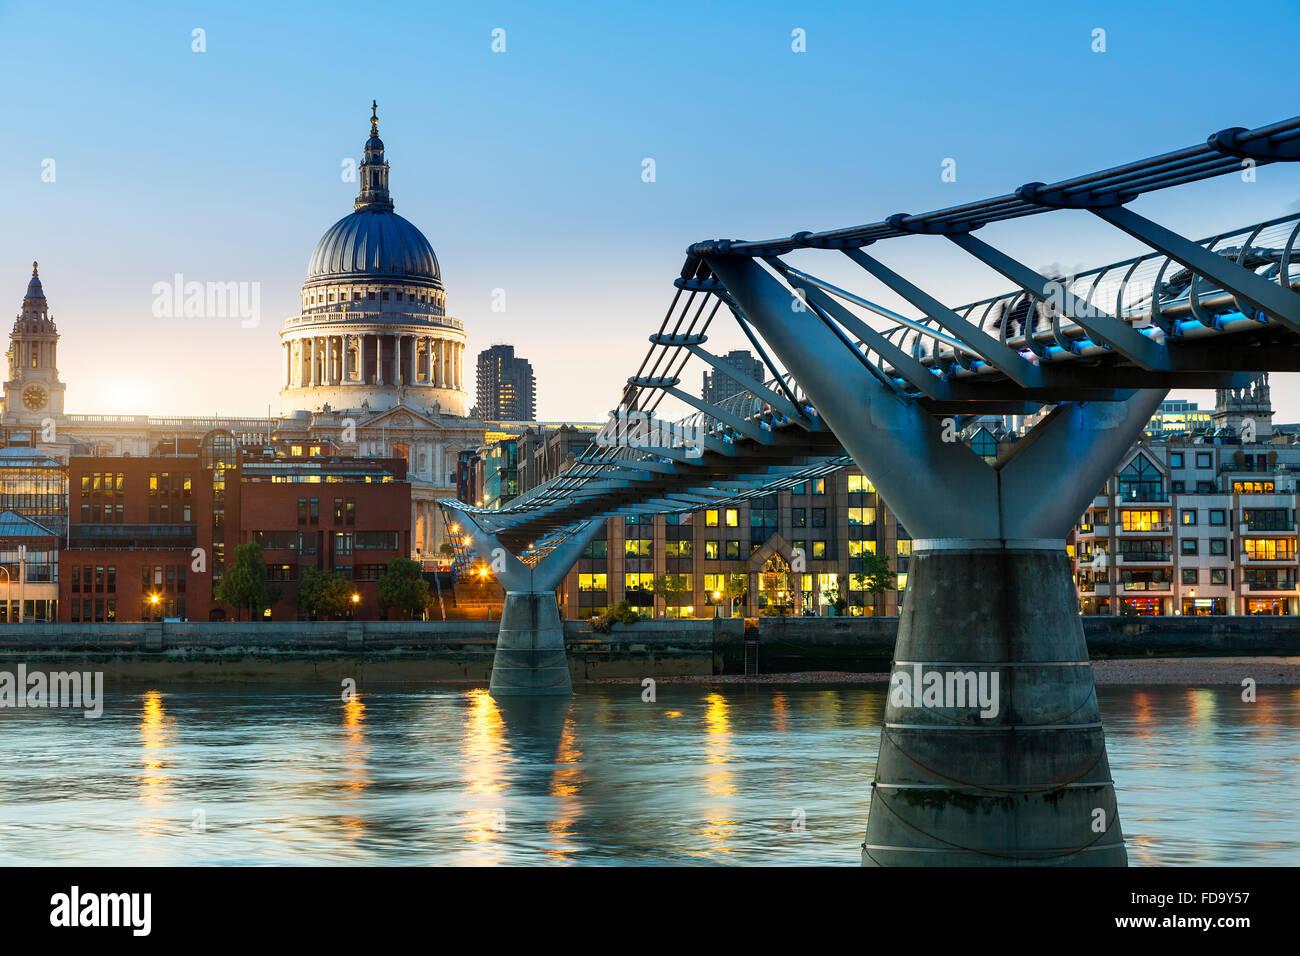 Londoner Millennium Fußgängerbrücke in der Abenddämmerung Stockbild